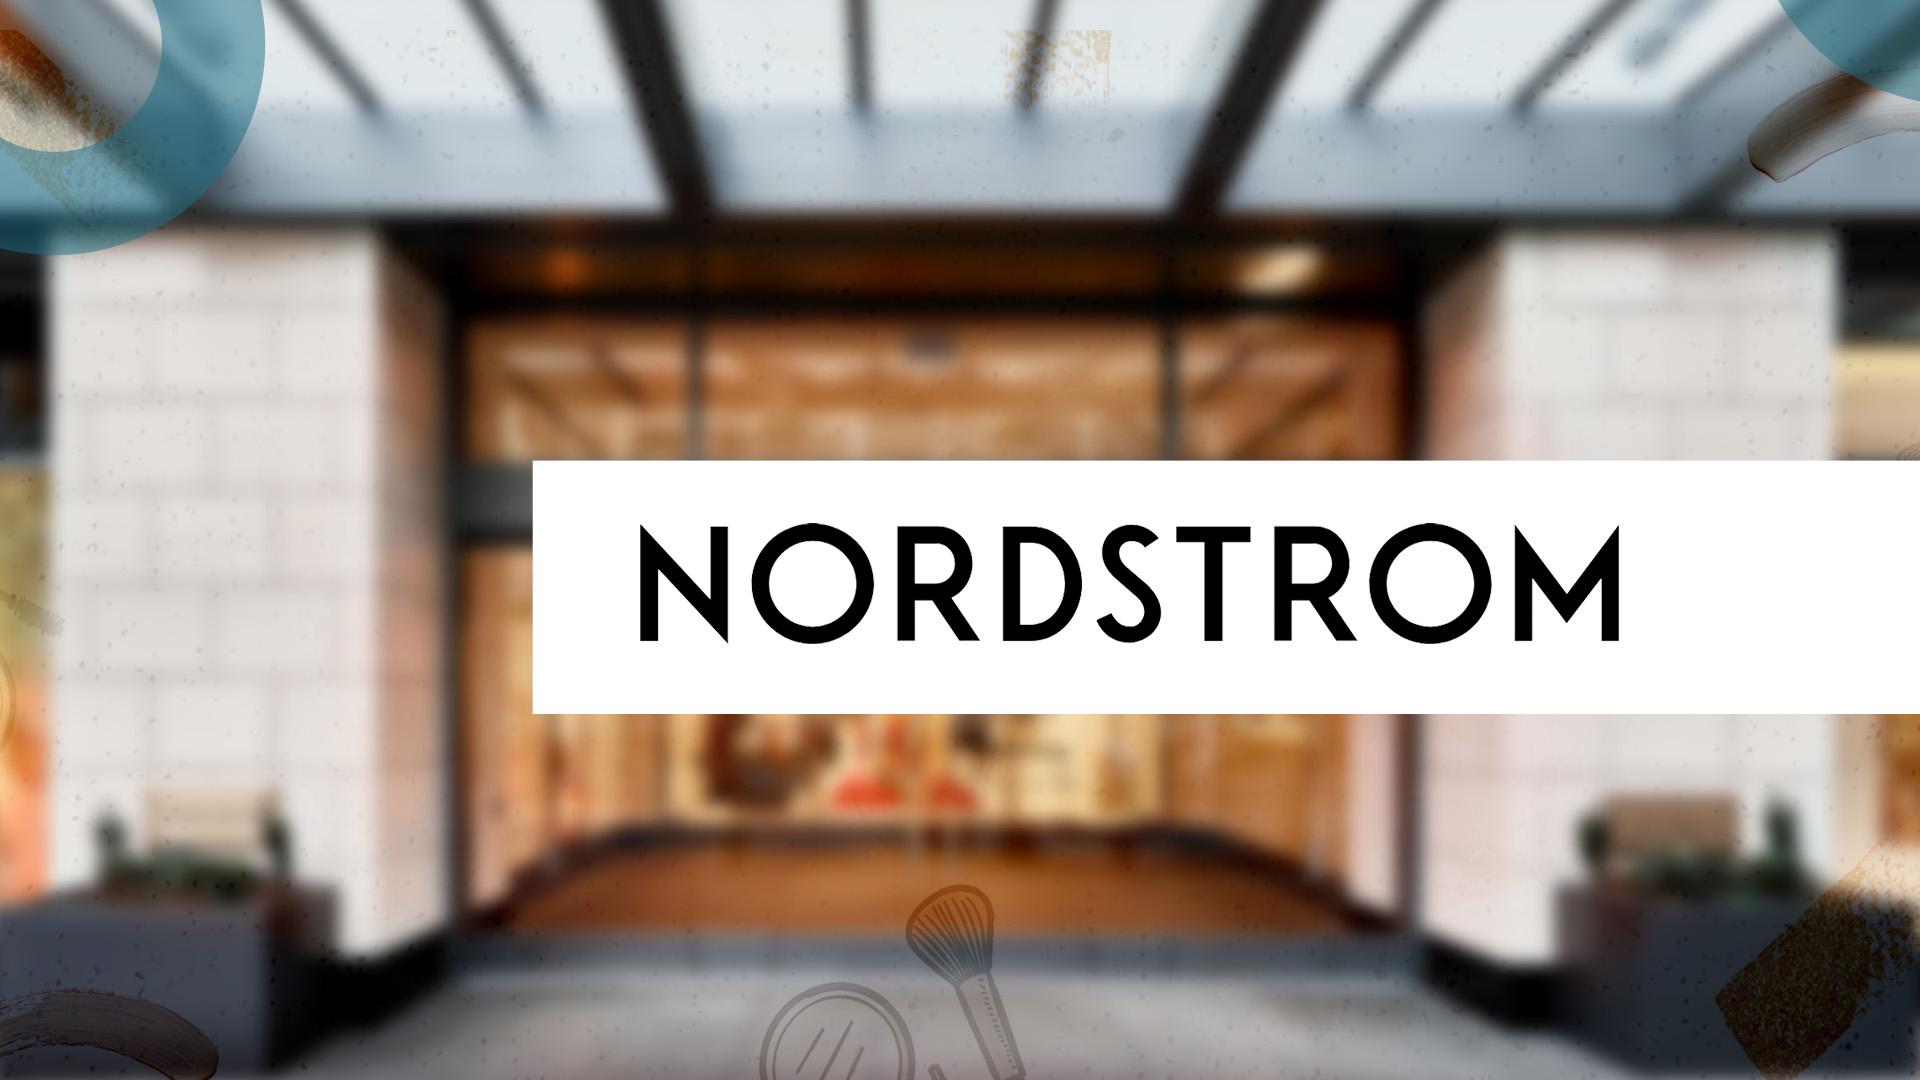 Nordstrom Retail